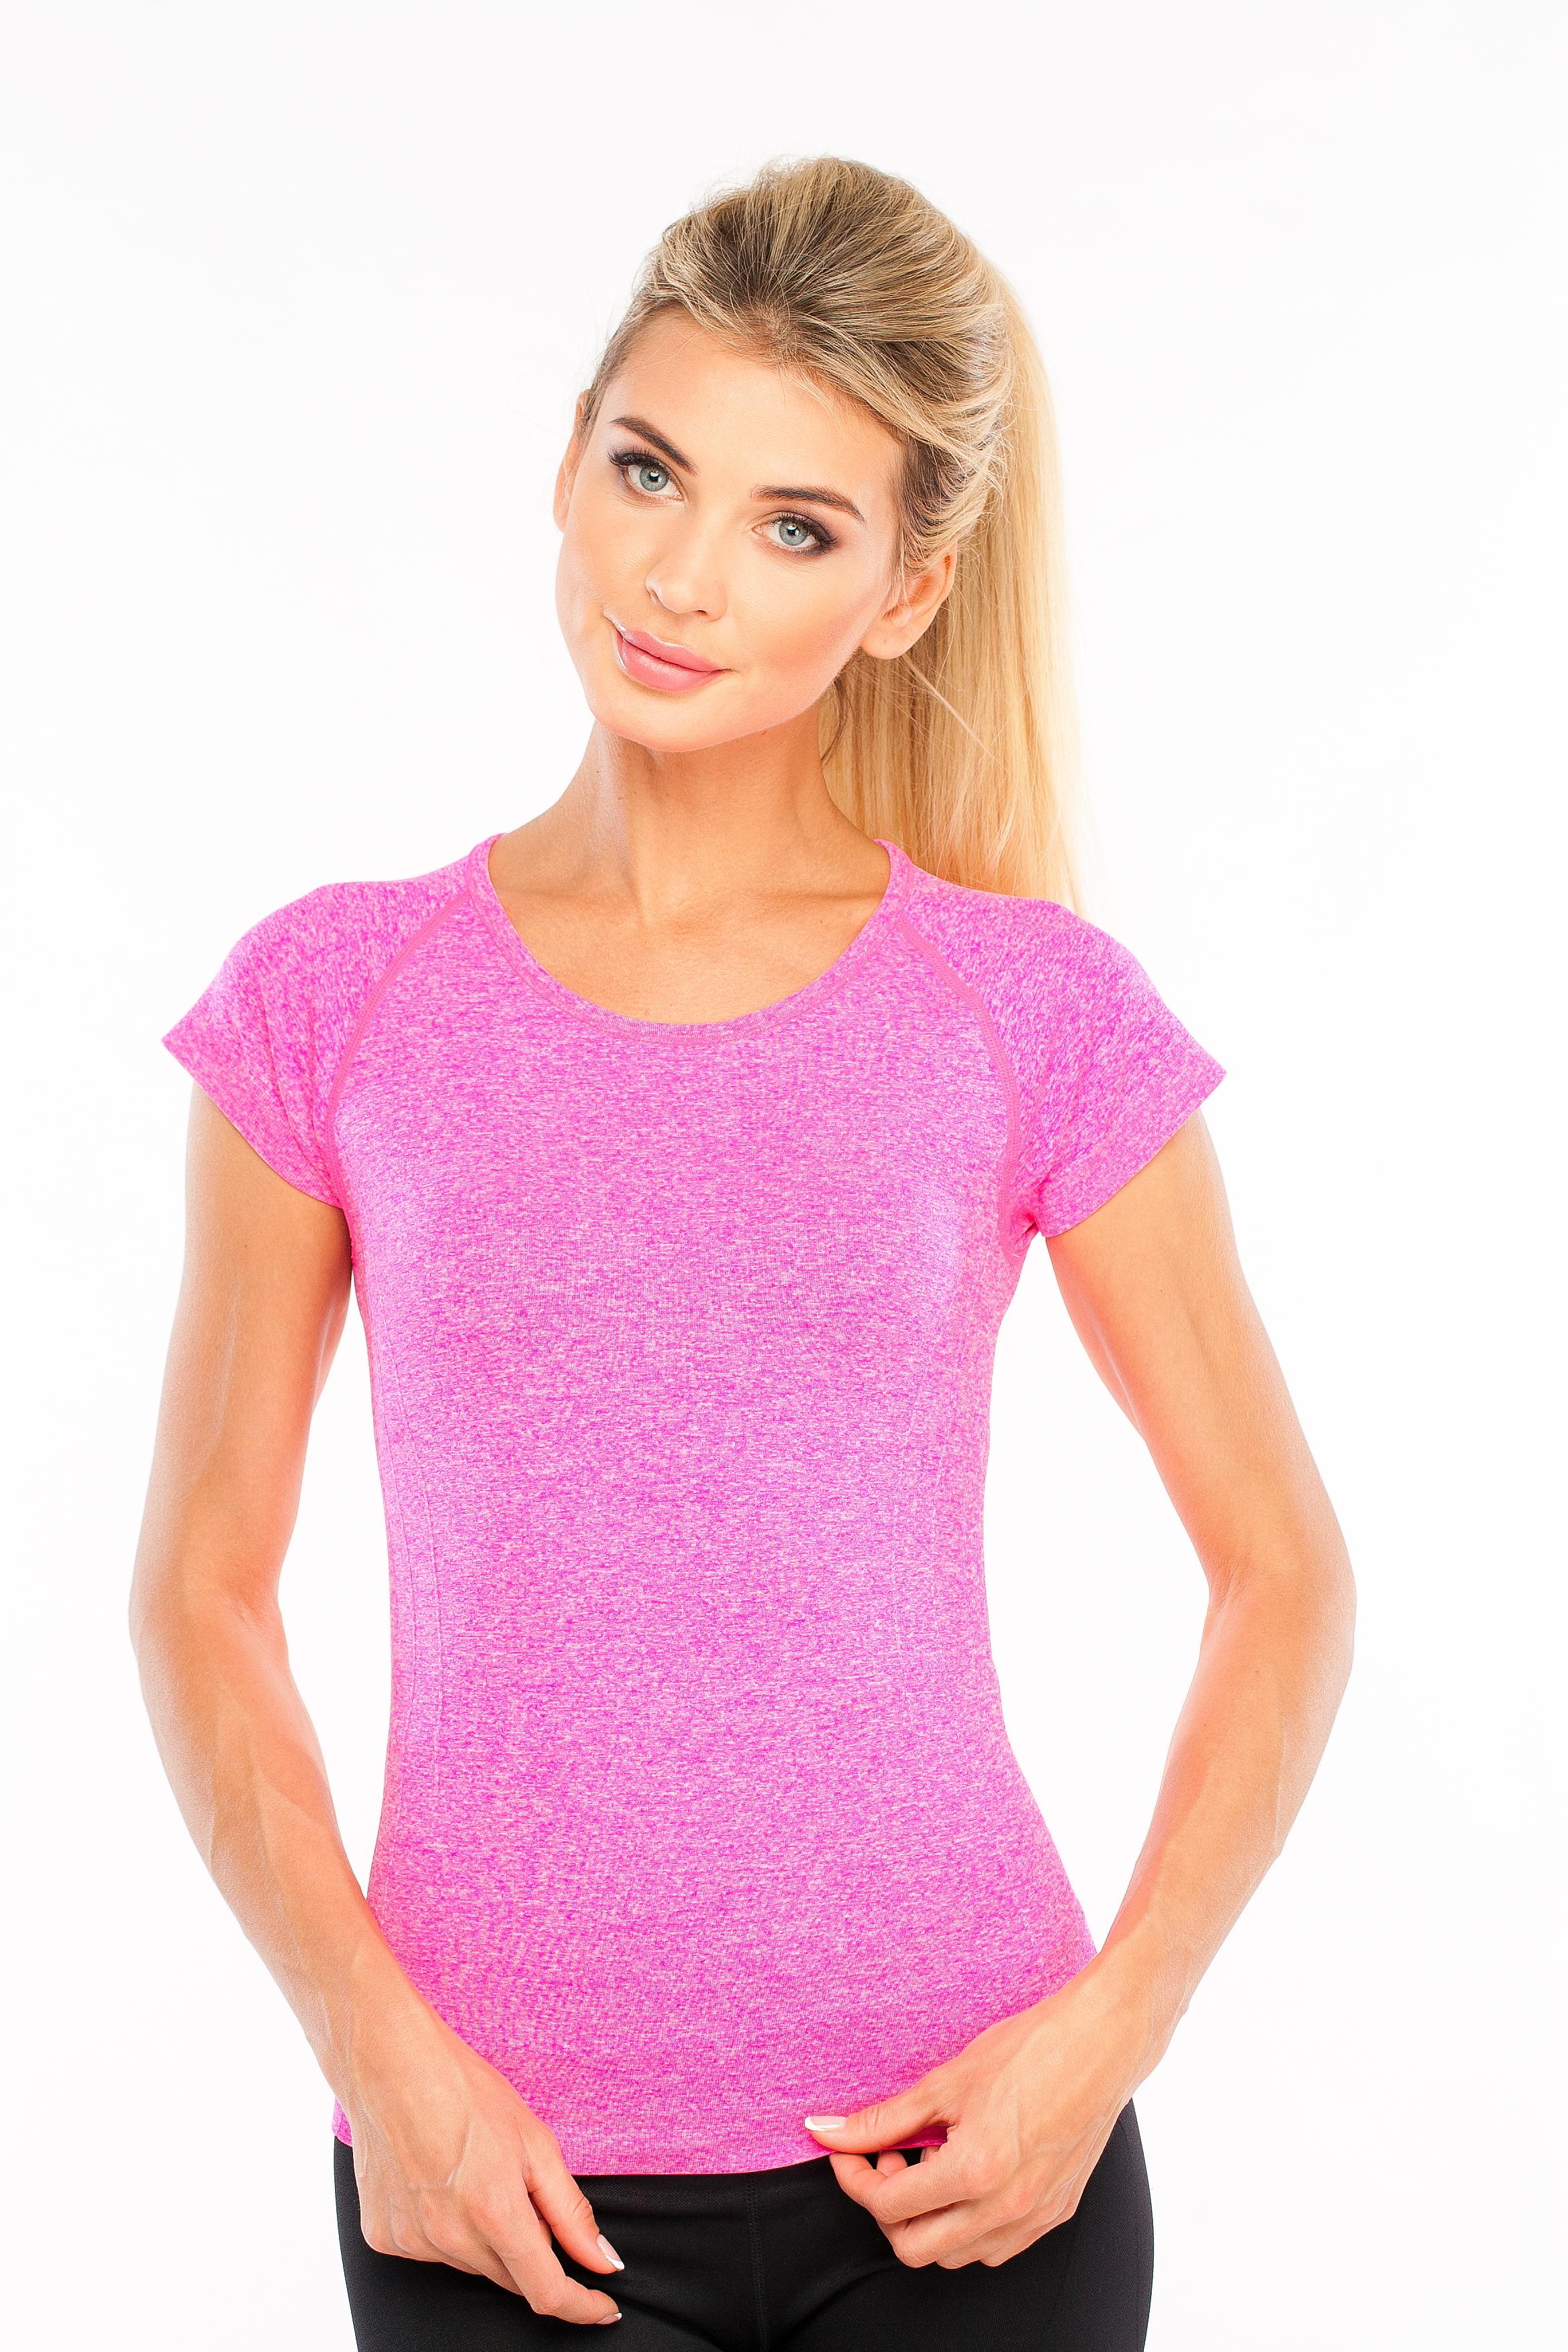 Футболка Pro-fit футболка pro fit розовый 42 размер